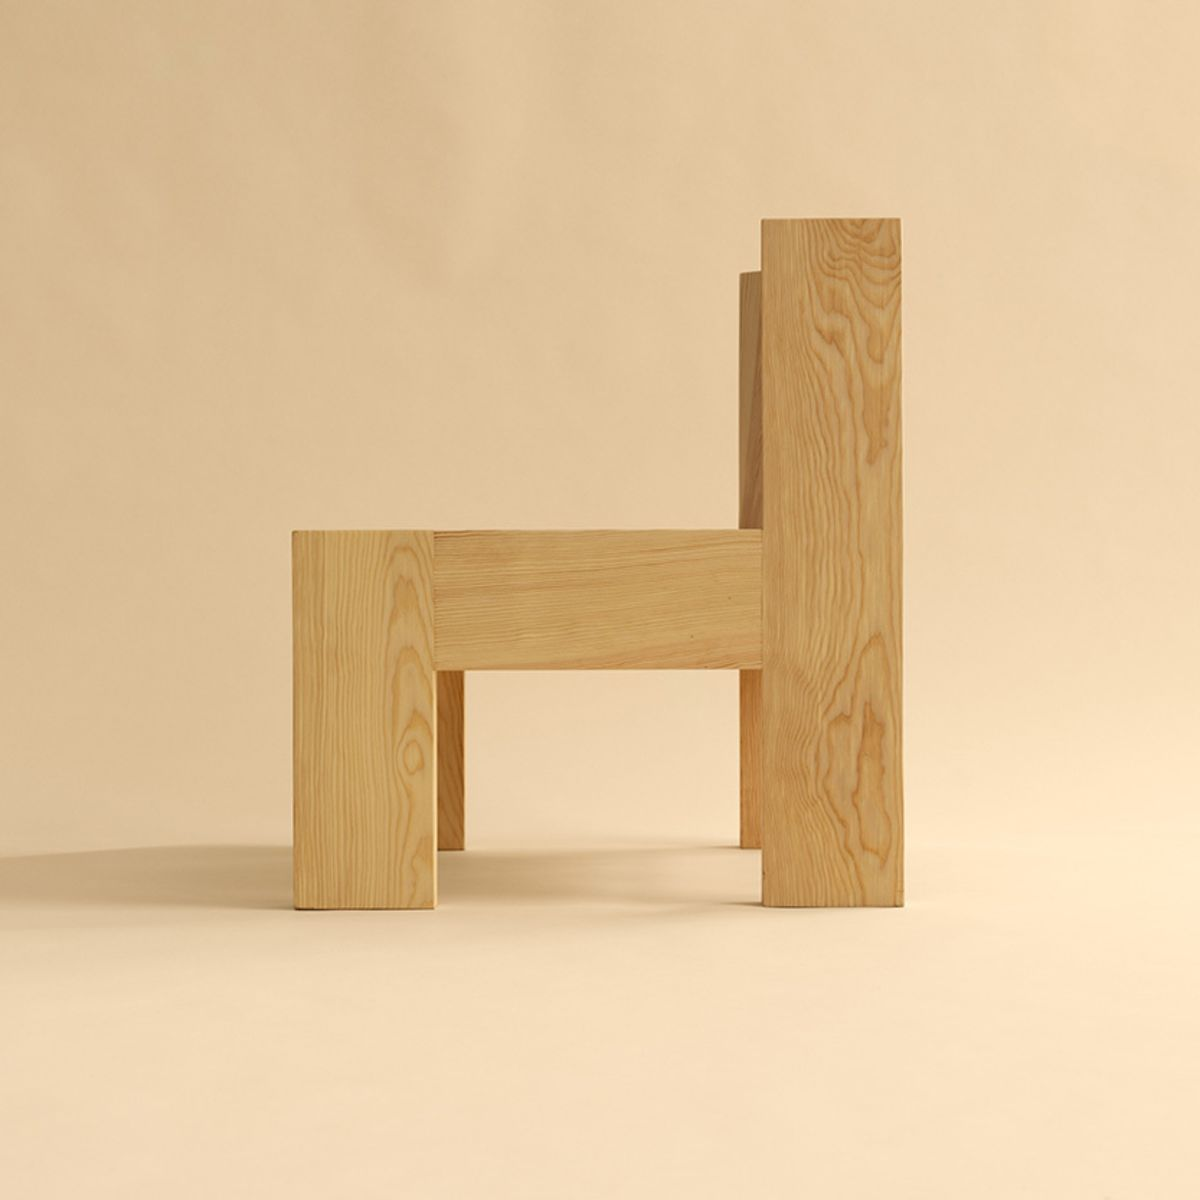 006_Lounge_Chair_mailer